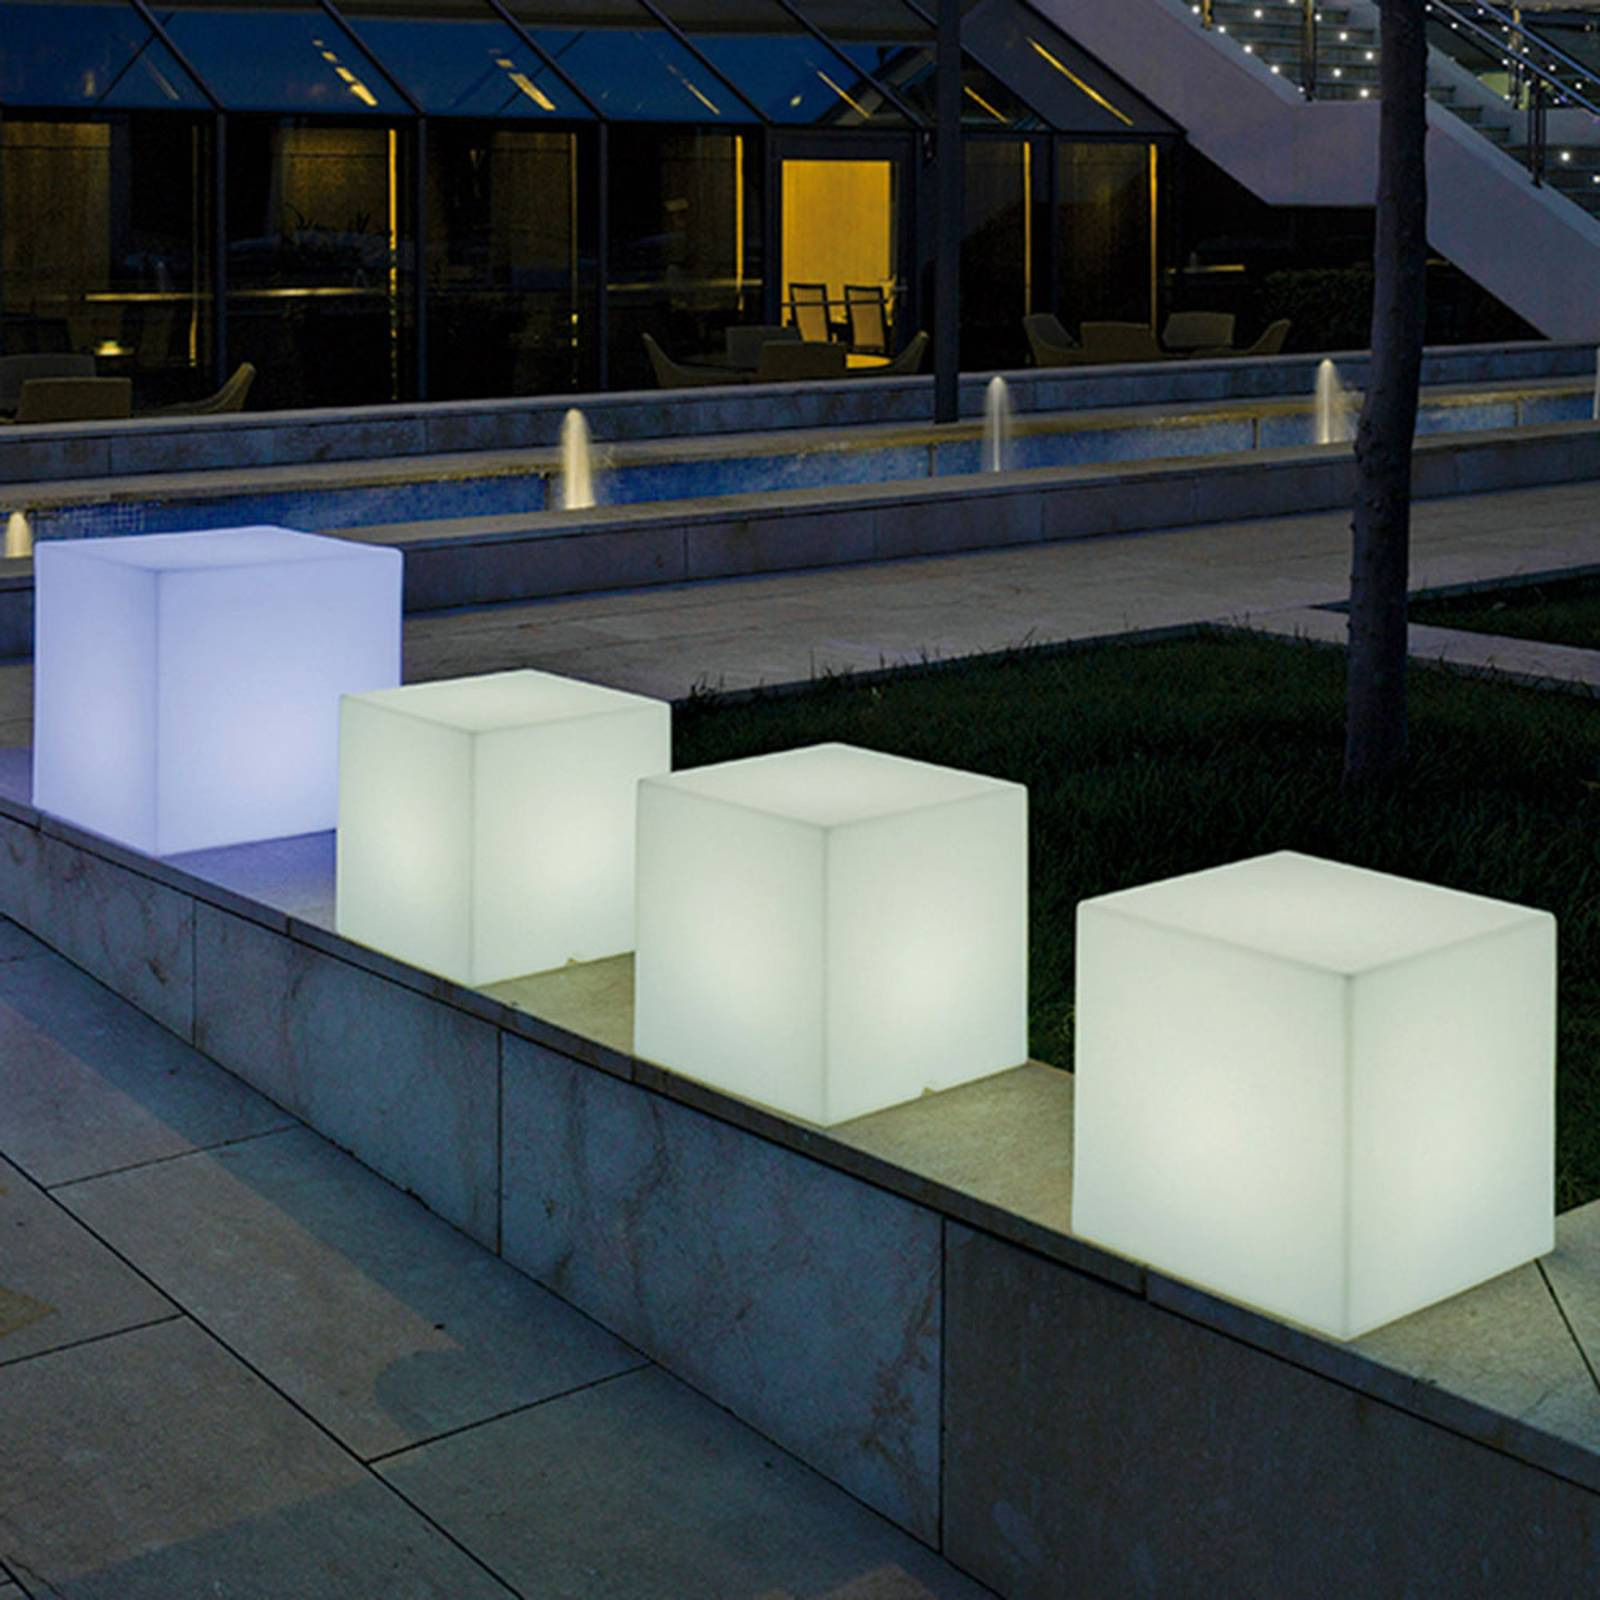 Newgarden lampa solarna Cuby kostka, 20 cm